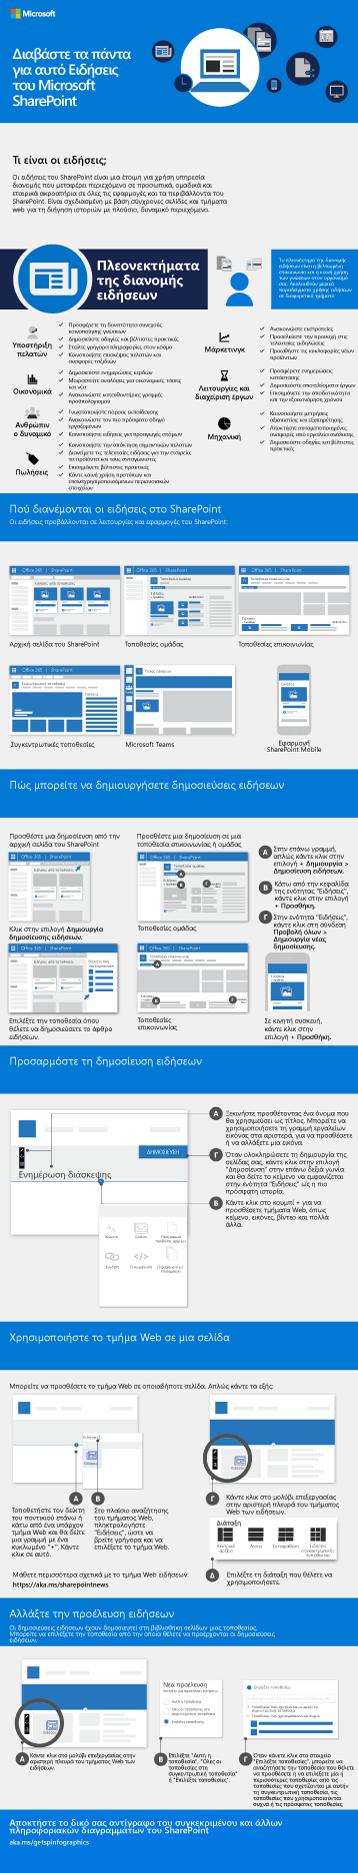 Infographic για τις Ειδήσεις στο SharePoint